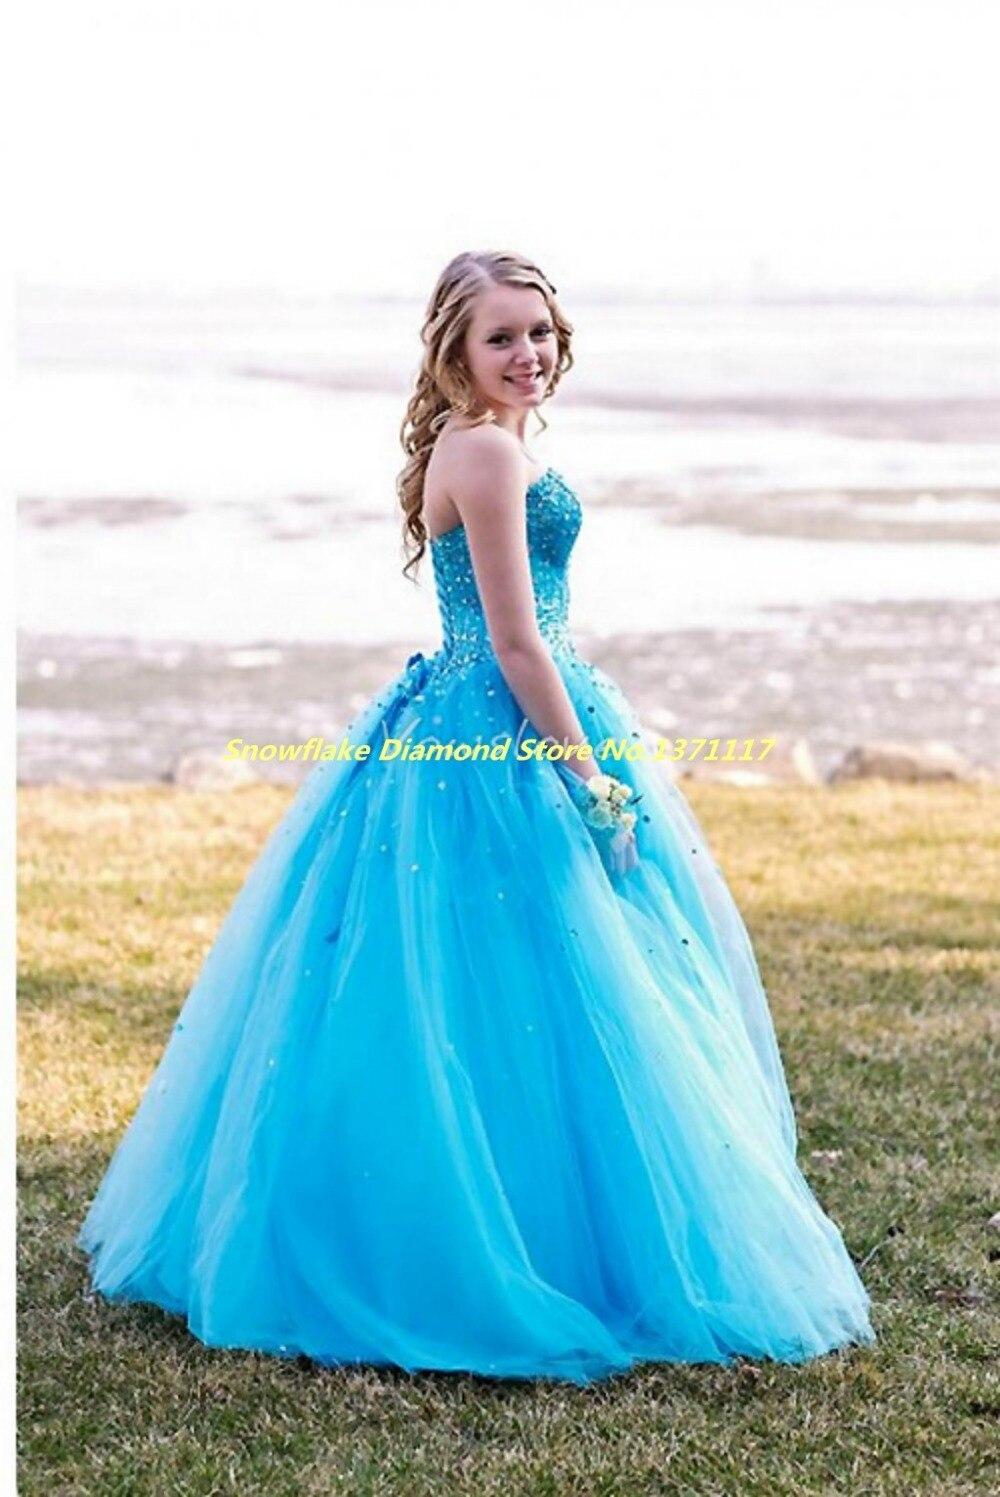 Modern Bianca Stratford Prom Dress Mold - All Wedding Dresses ...